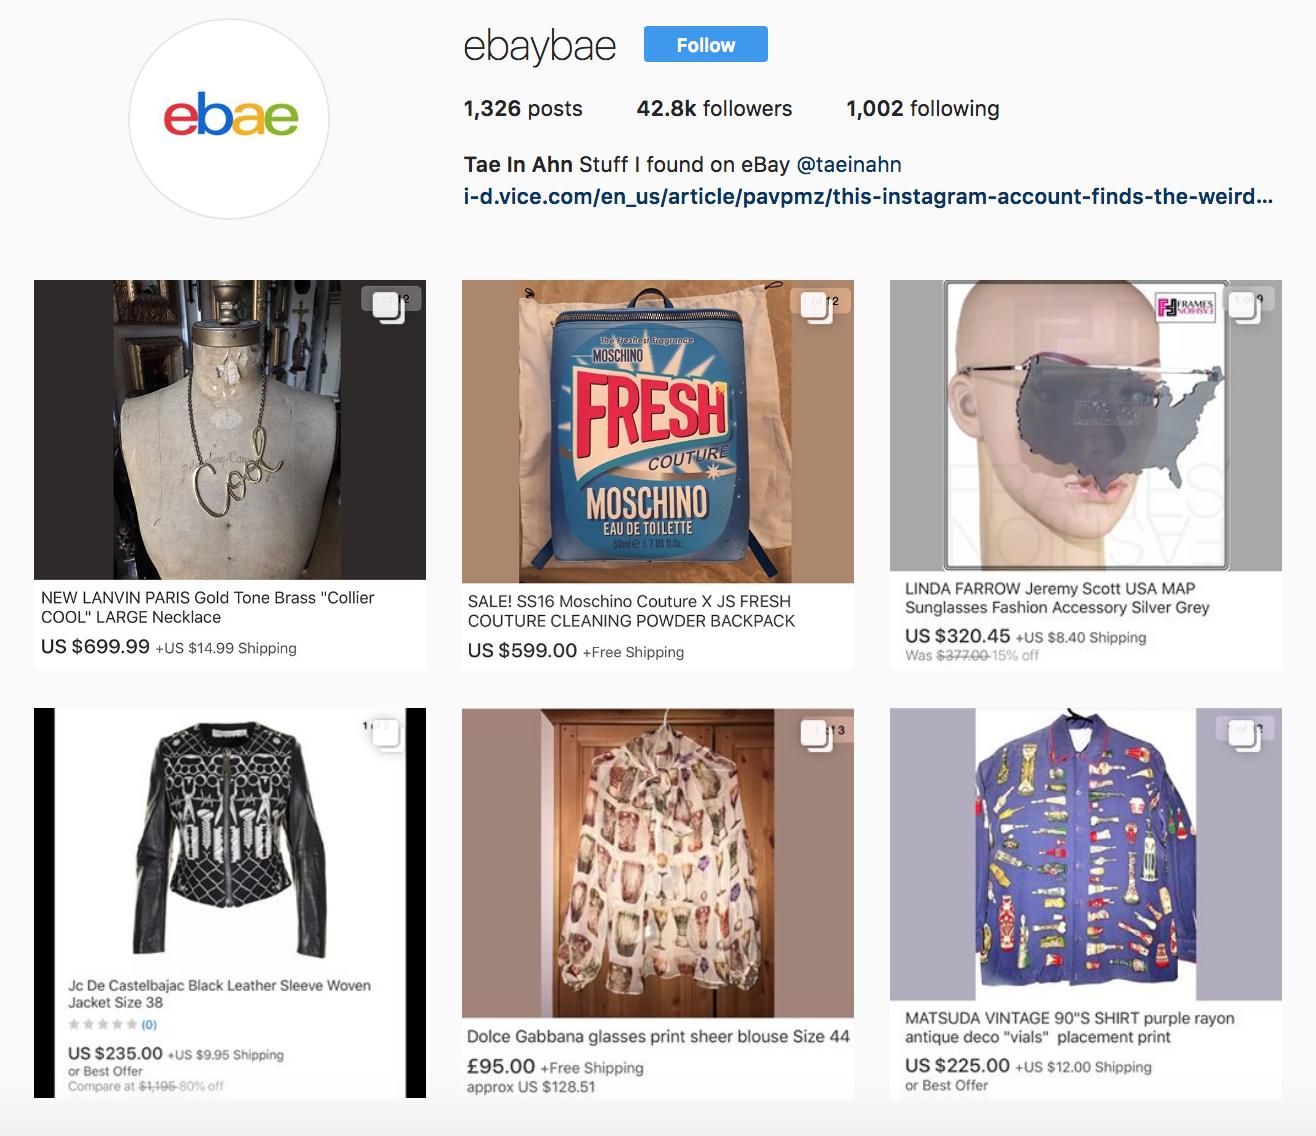 eBay Bae